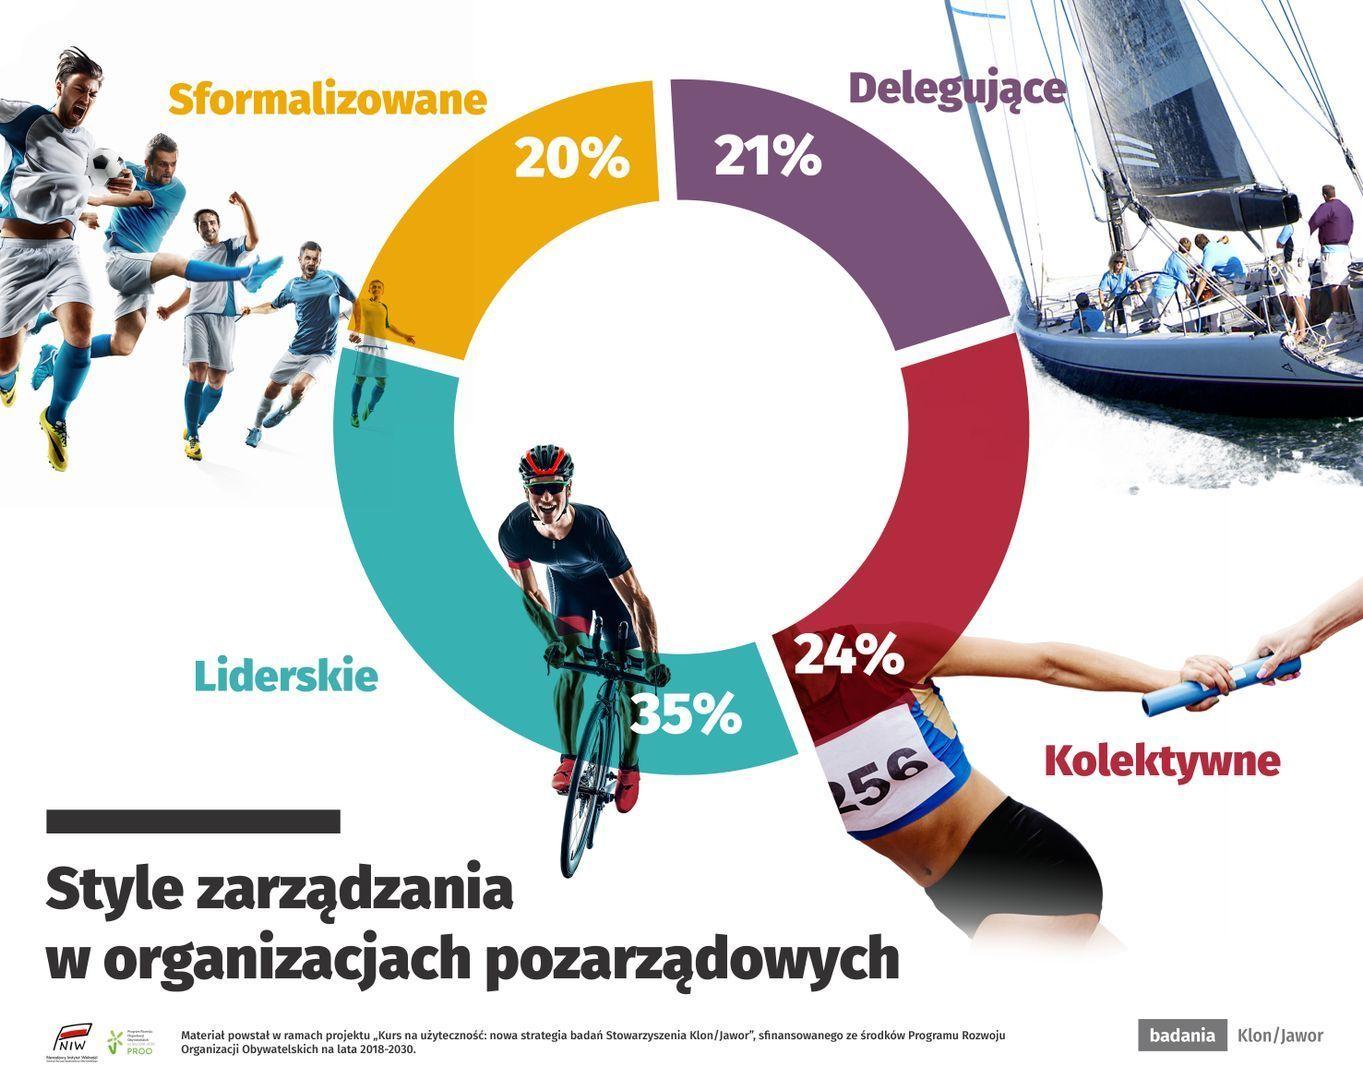 Pod Lupą ngo.pl: style zarządzania